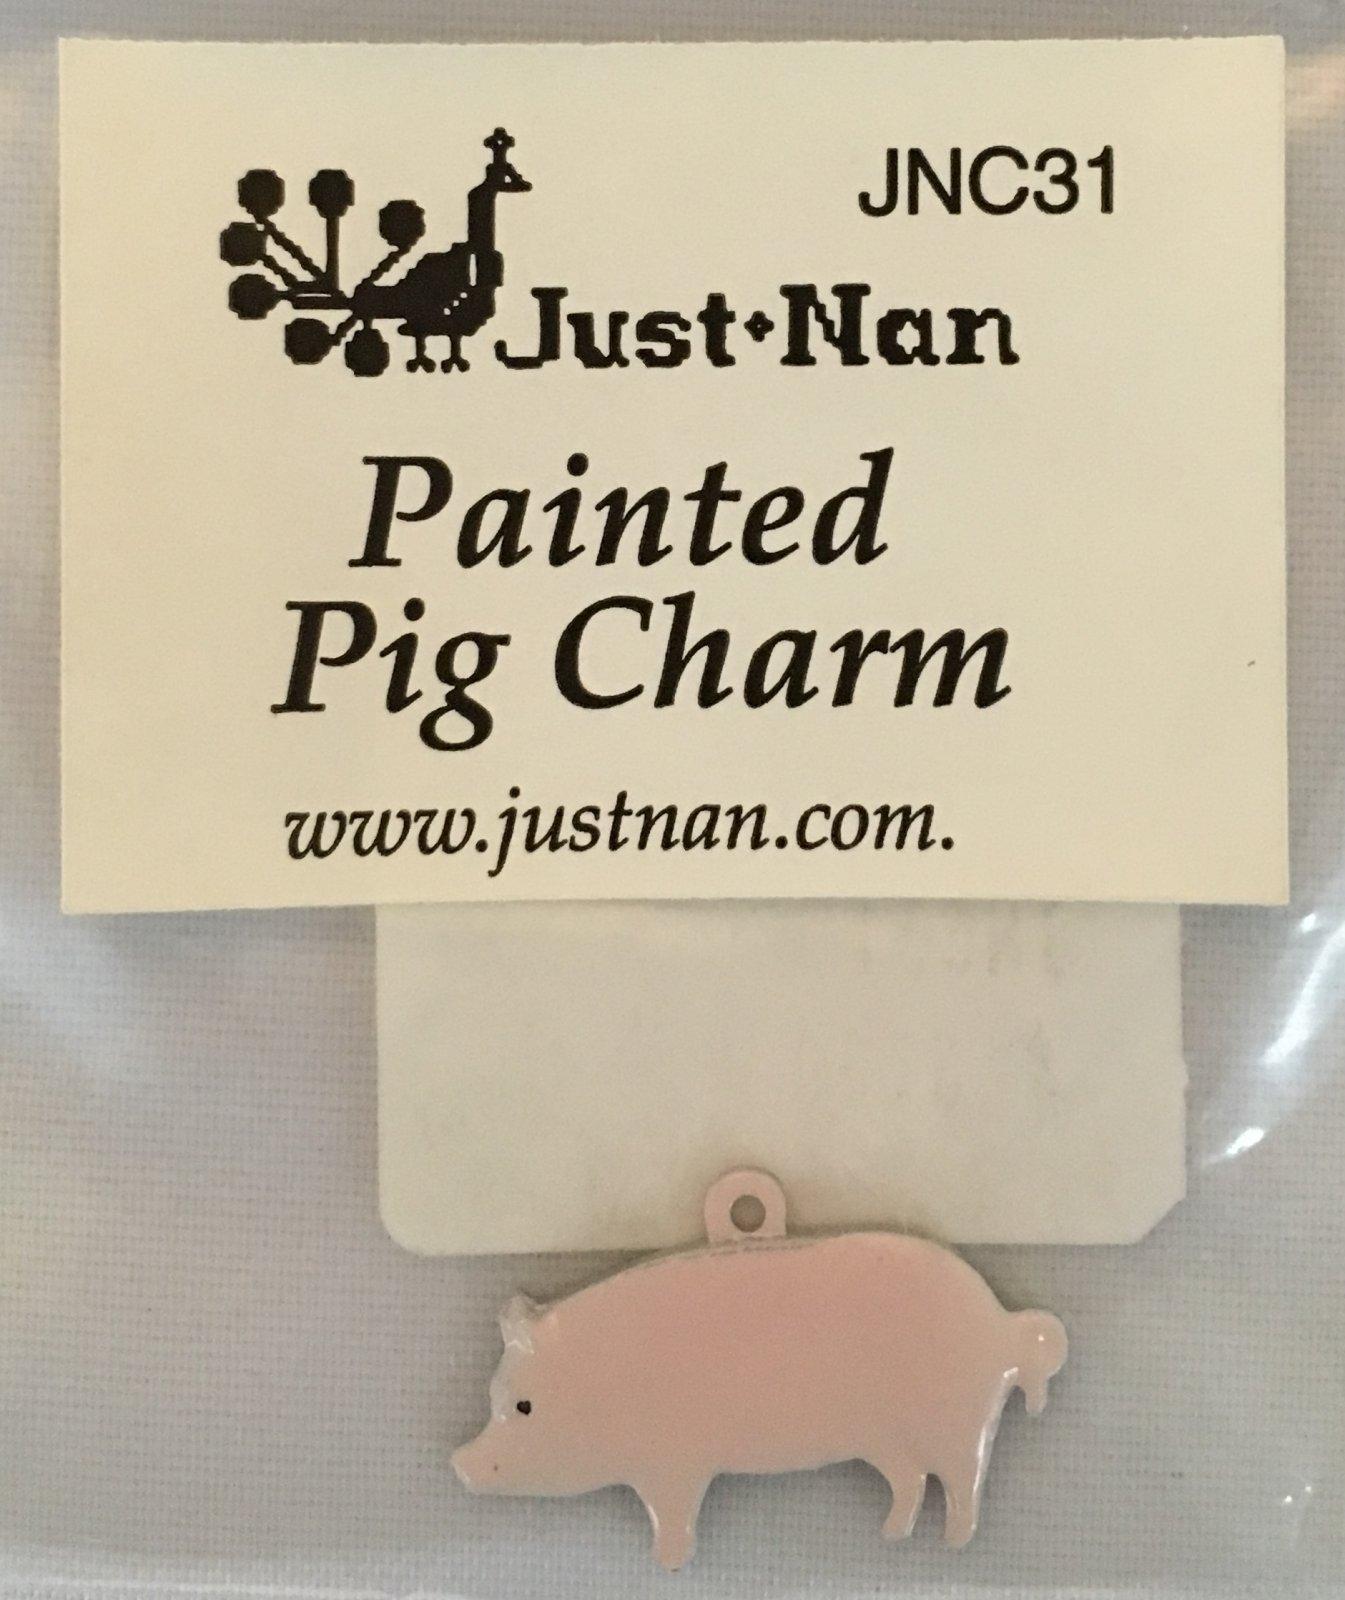 Just Nan JNC31